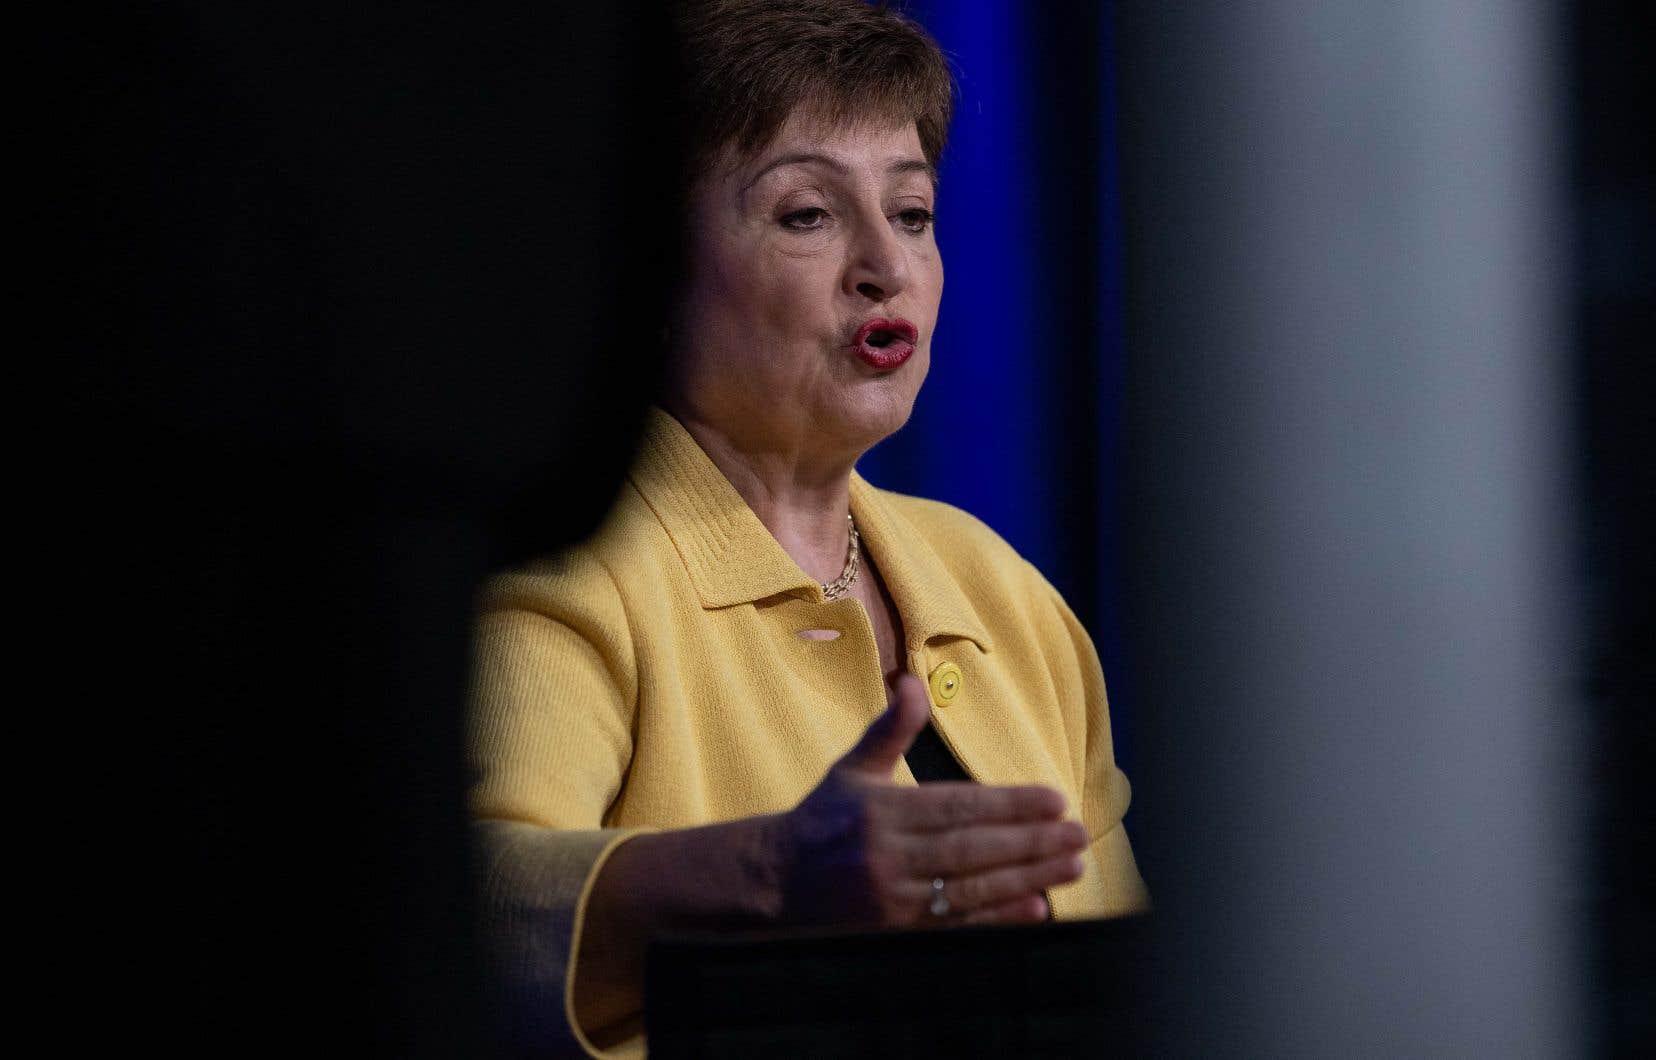 La directrice générale du Fonds monétaire international, Kristalina Georgieva